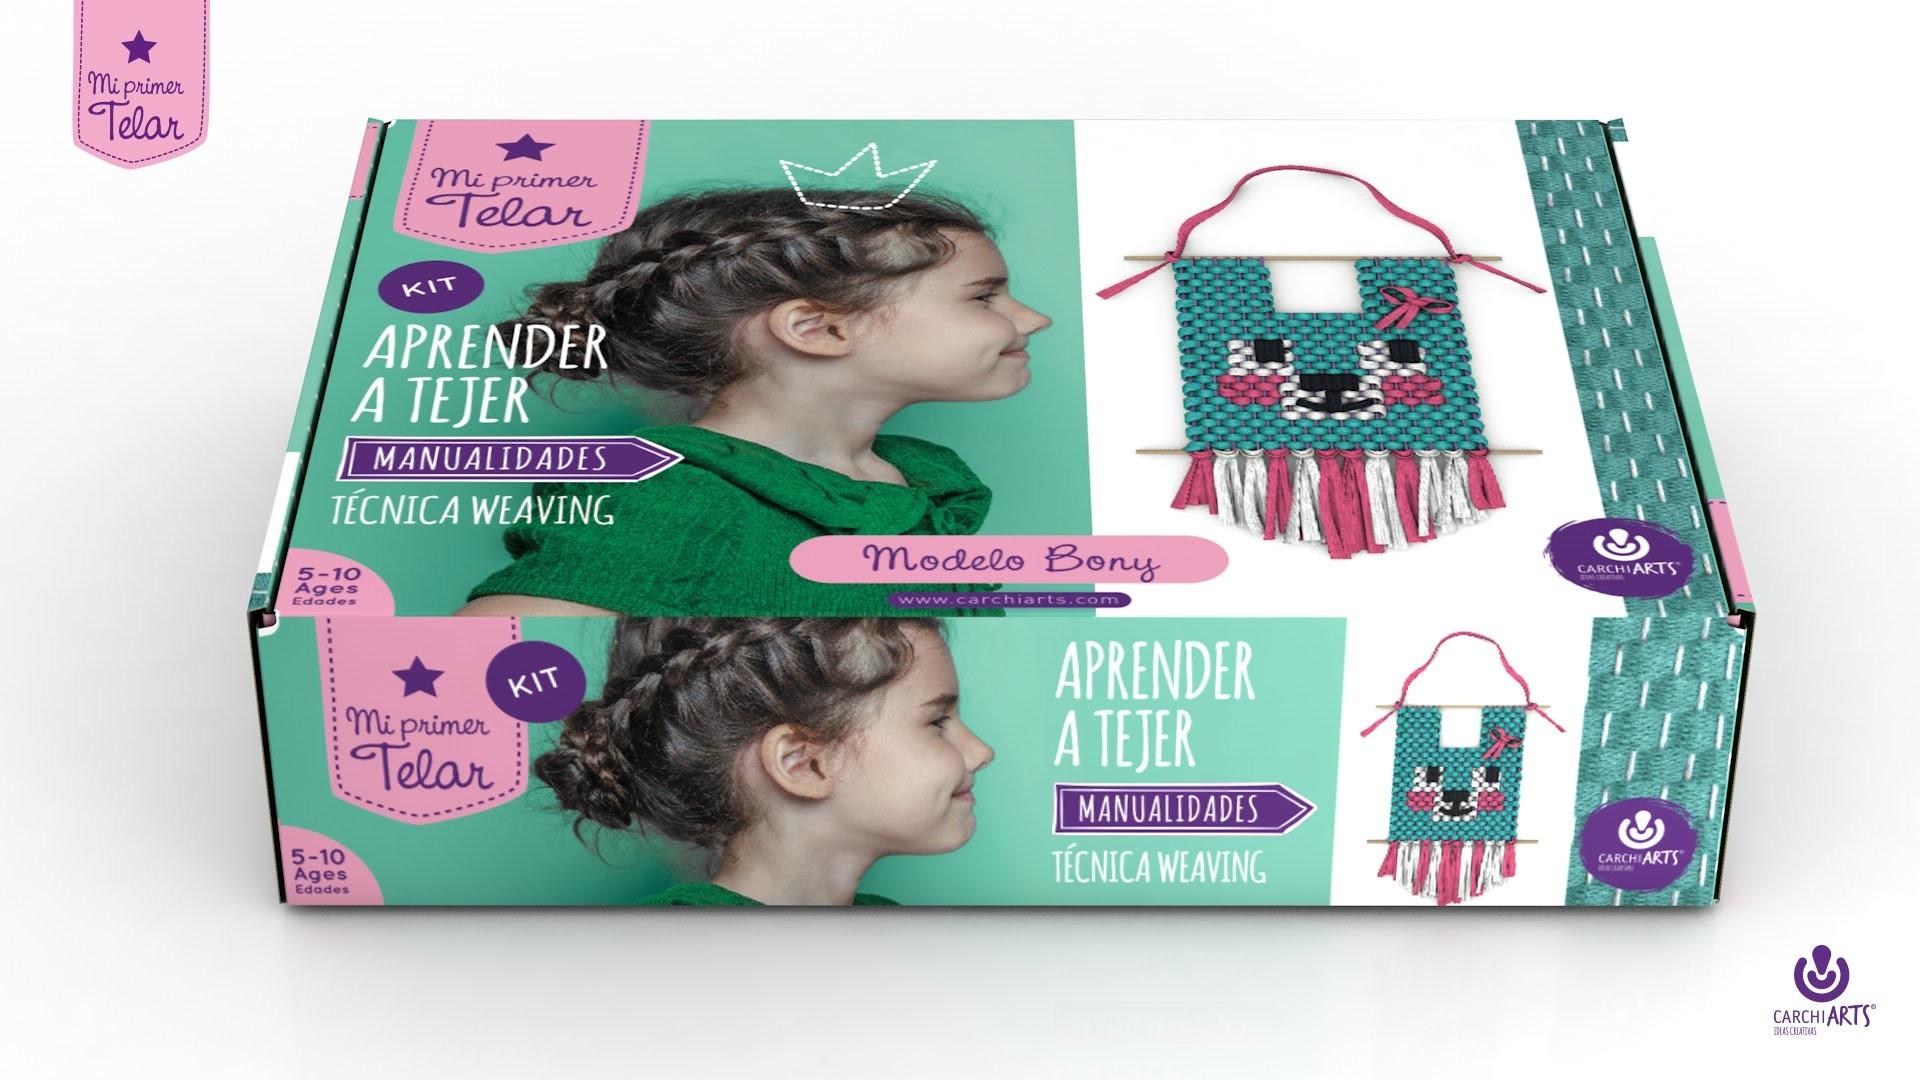 MI PRIMER TELAR: weaving. Manualidades para niños